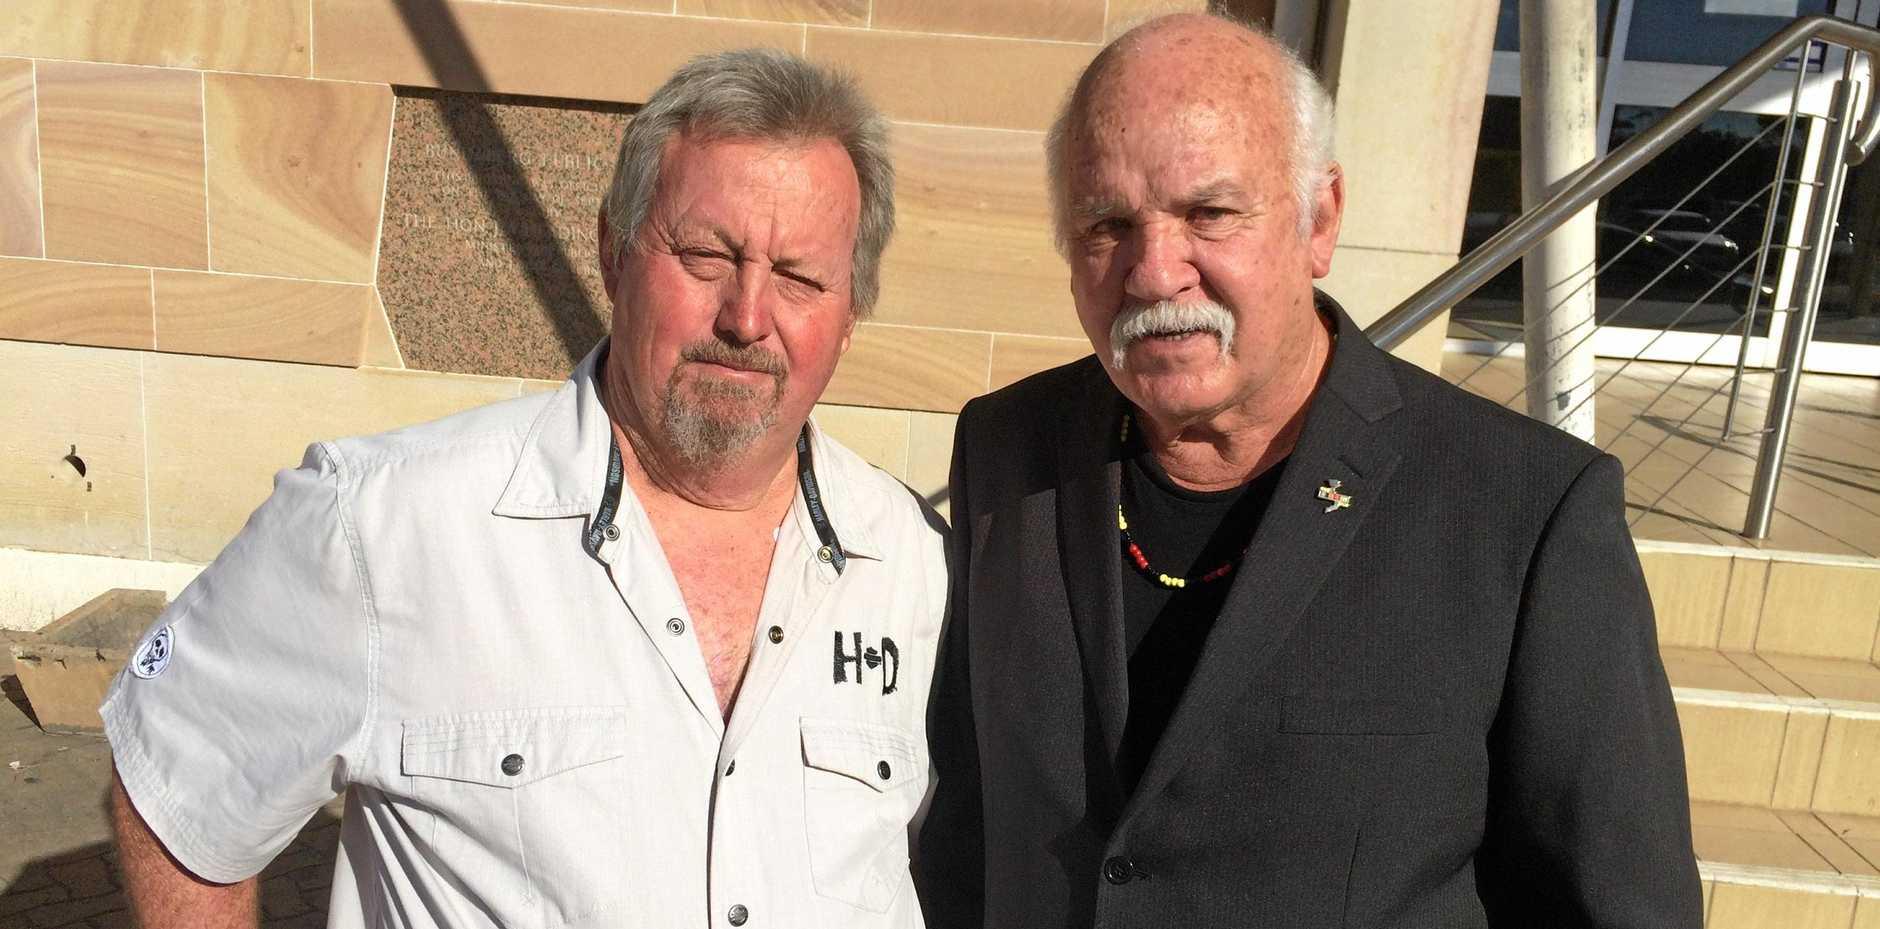 HEAVY FINE: Phillip Hunt and Roger Saunders outside court.